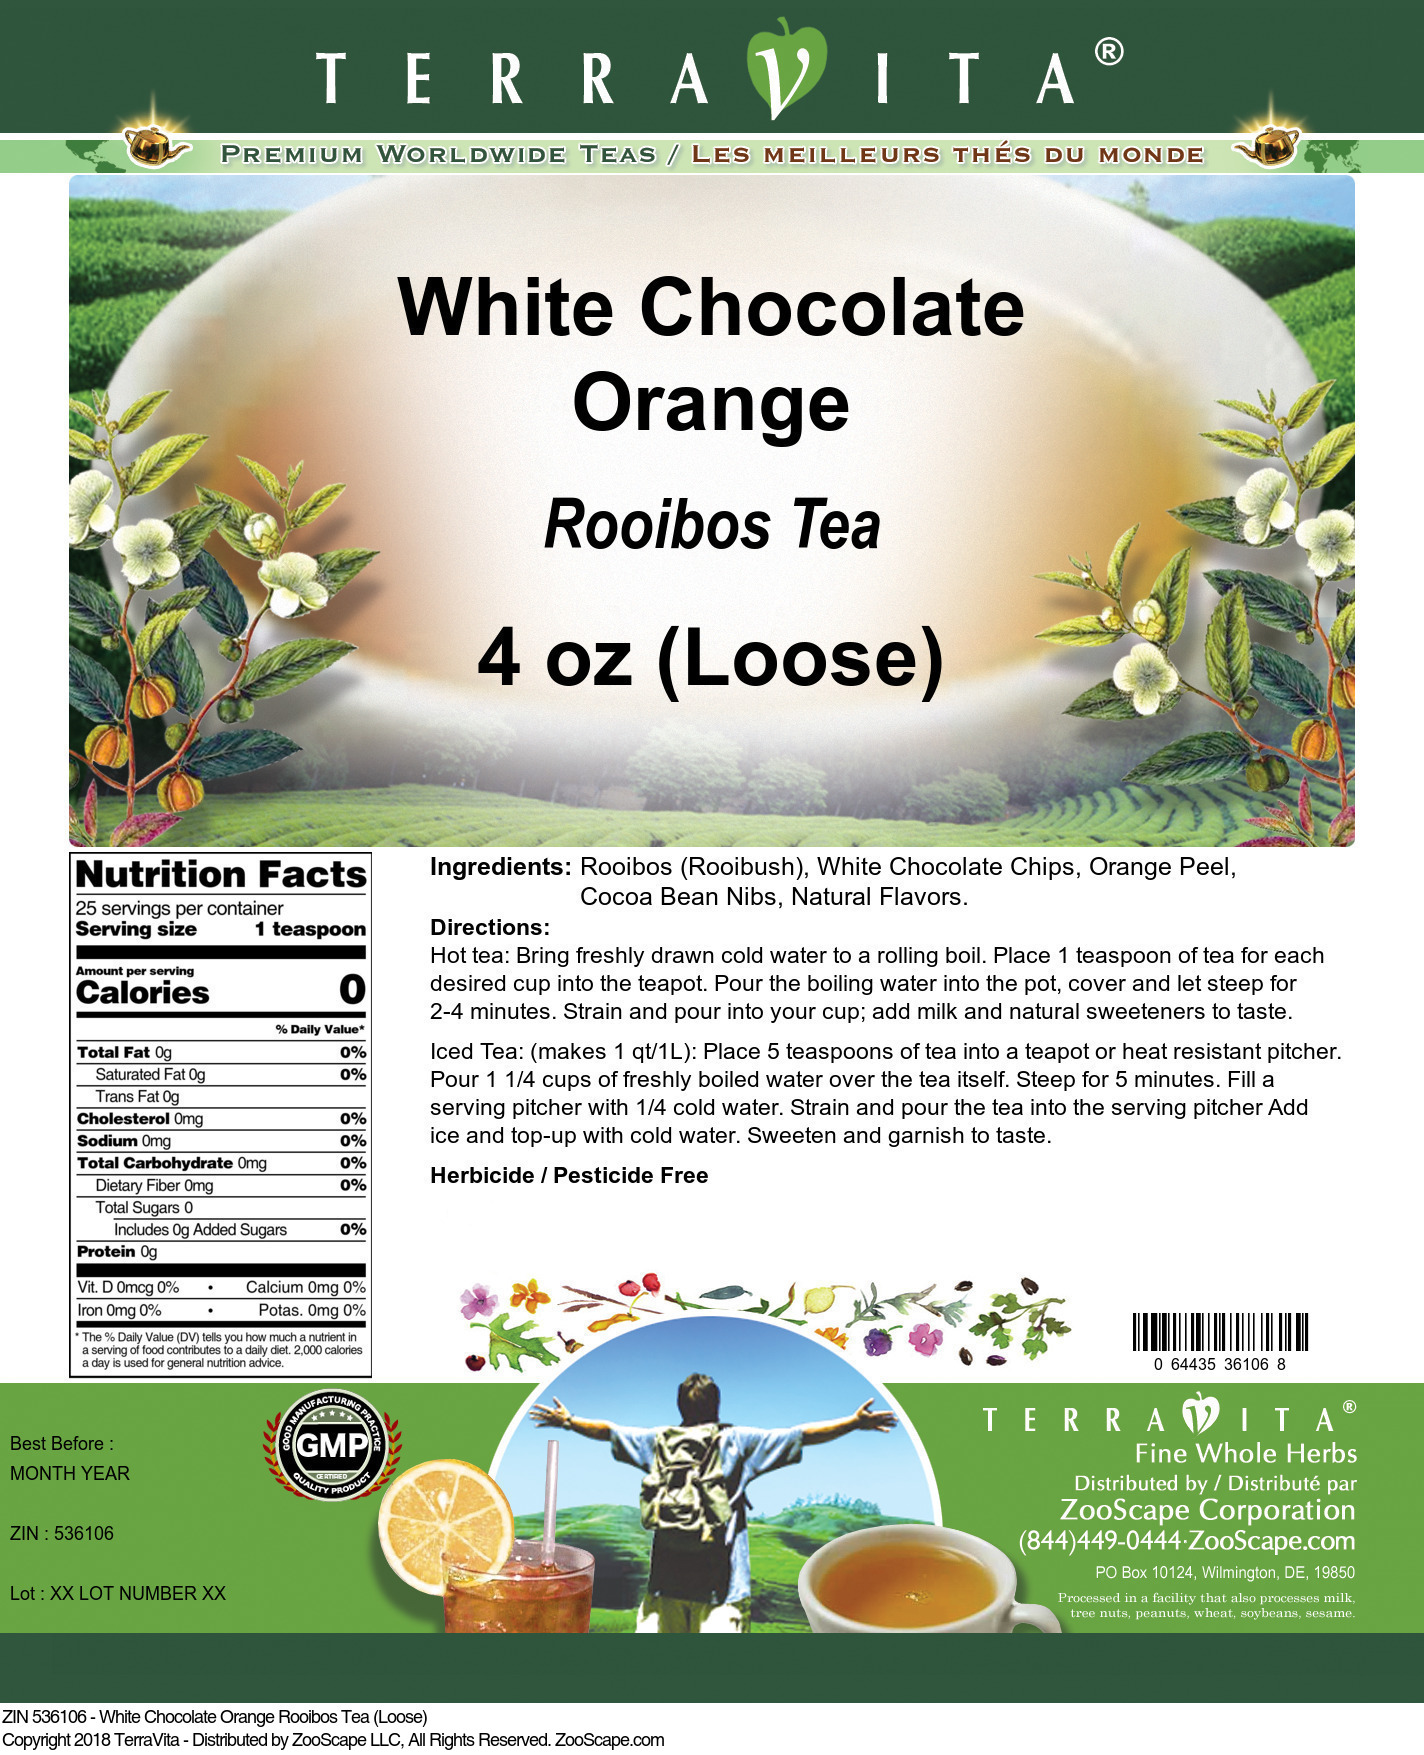 White Chocolate Orange Rooibos Tea (Loose)